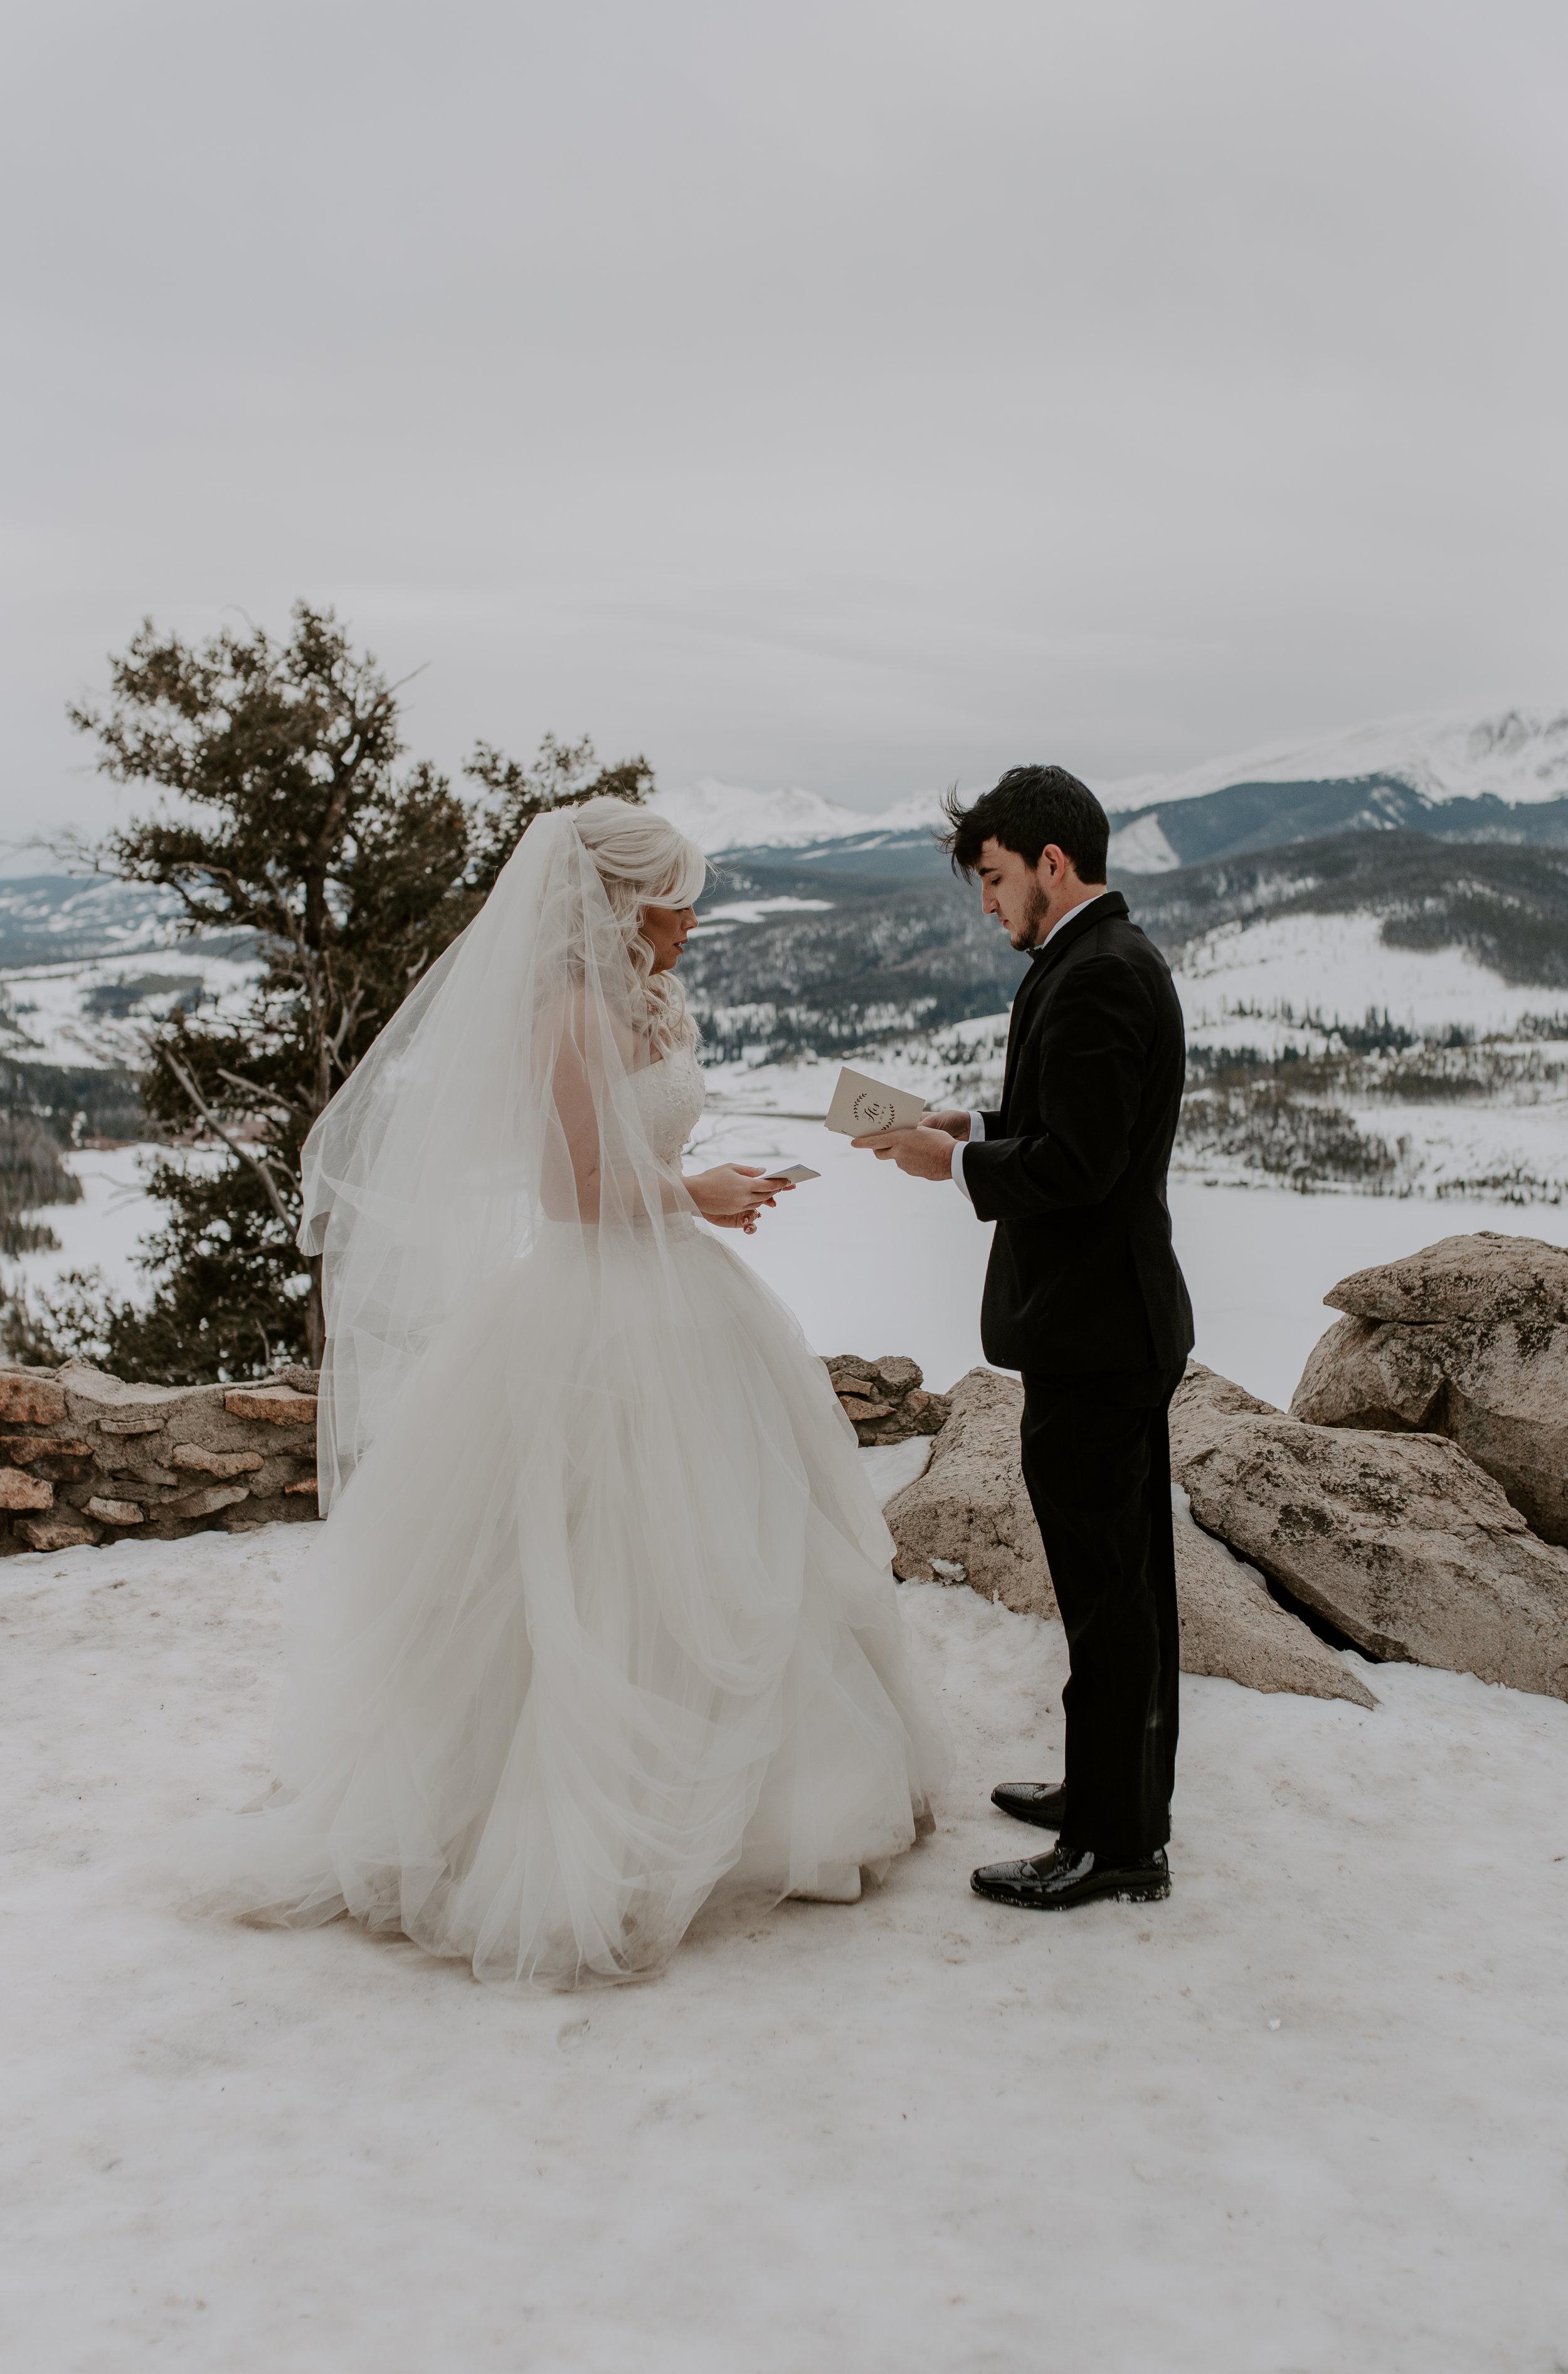 Colorado elopement photographer based in Denver. Sapphire Point winter elopement.